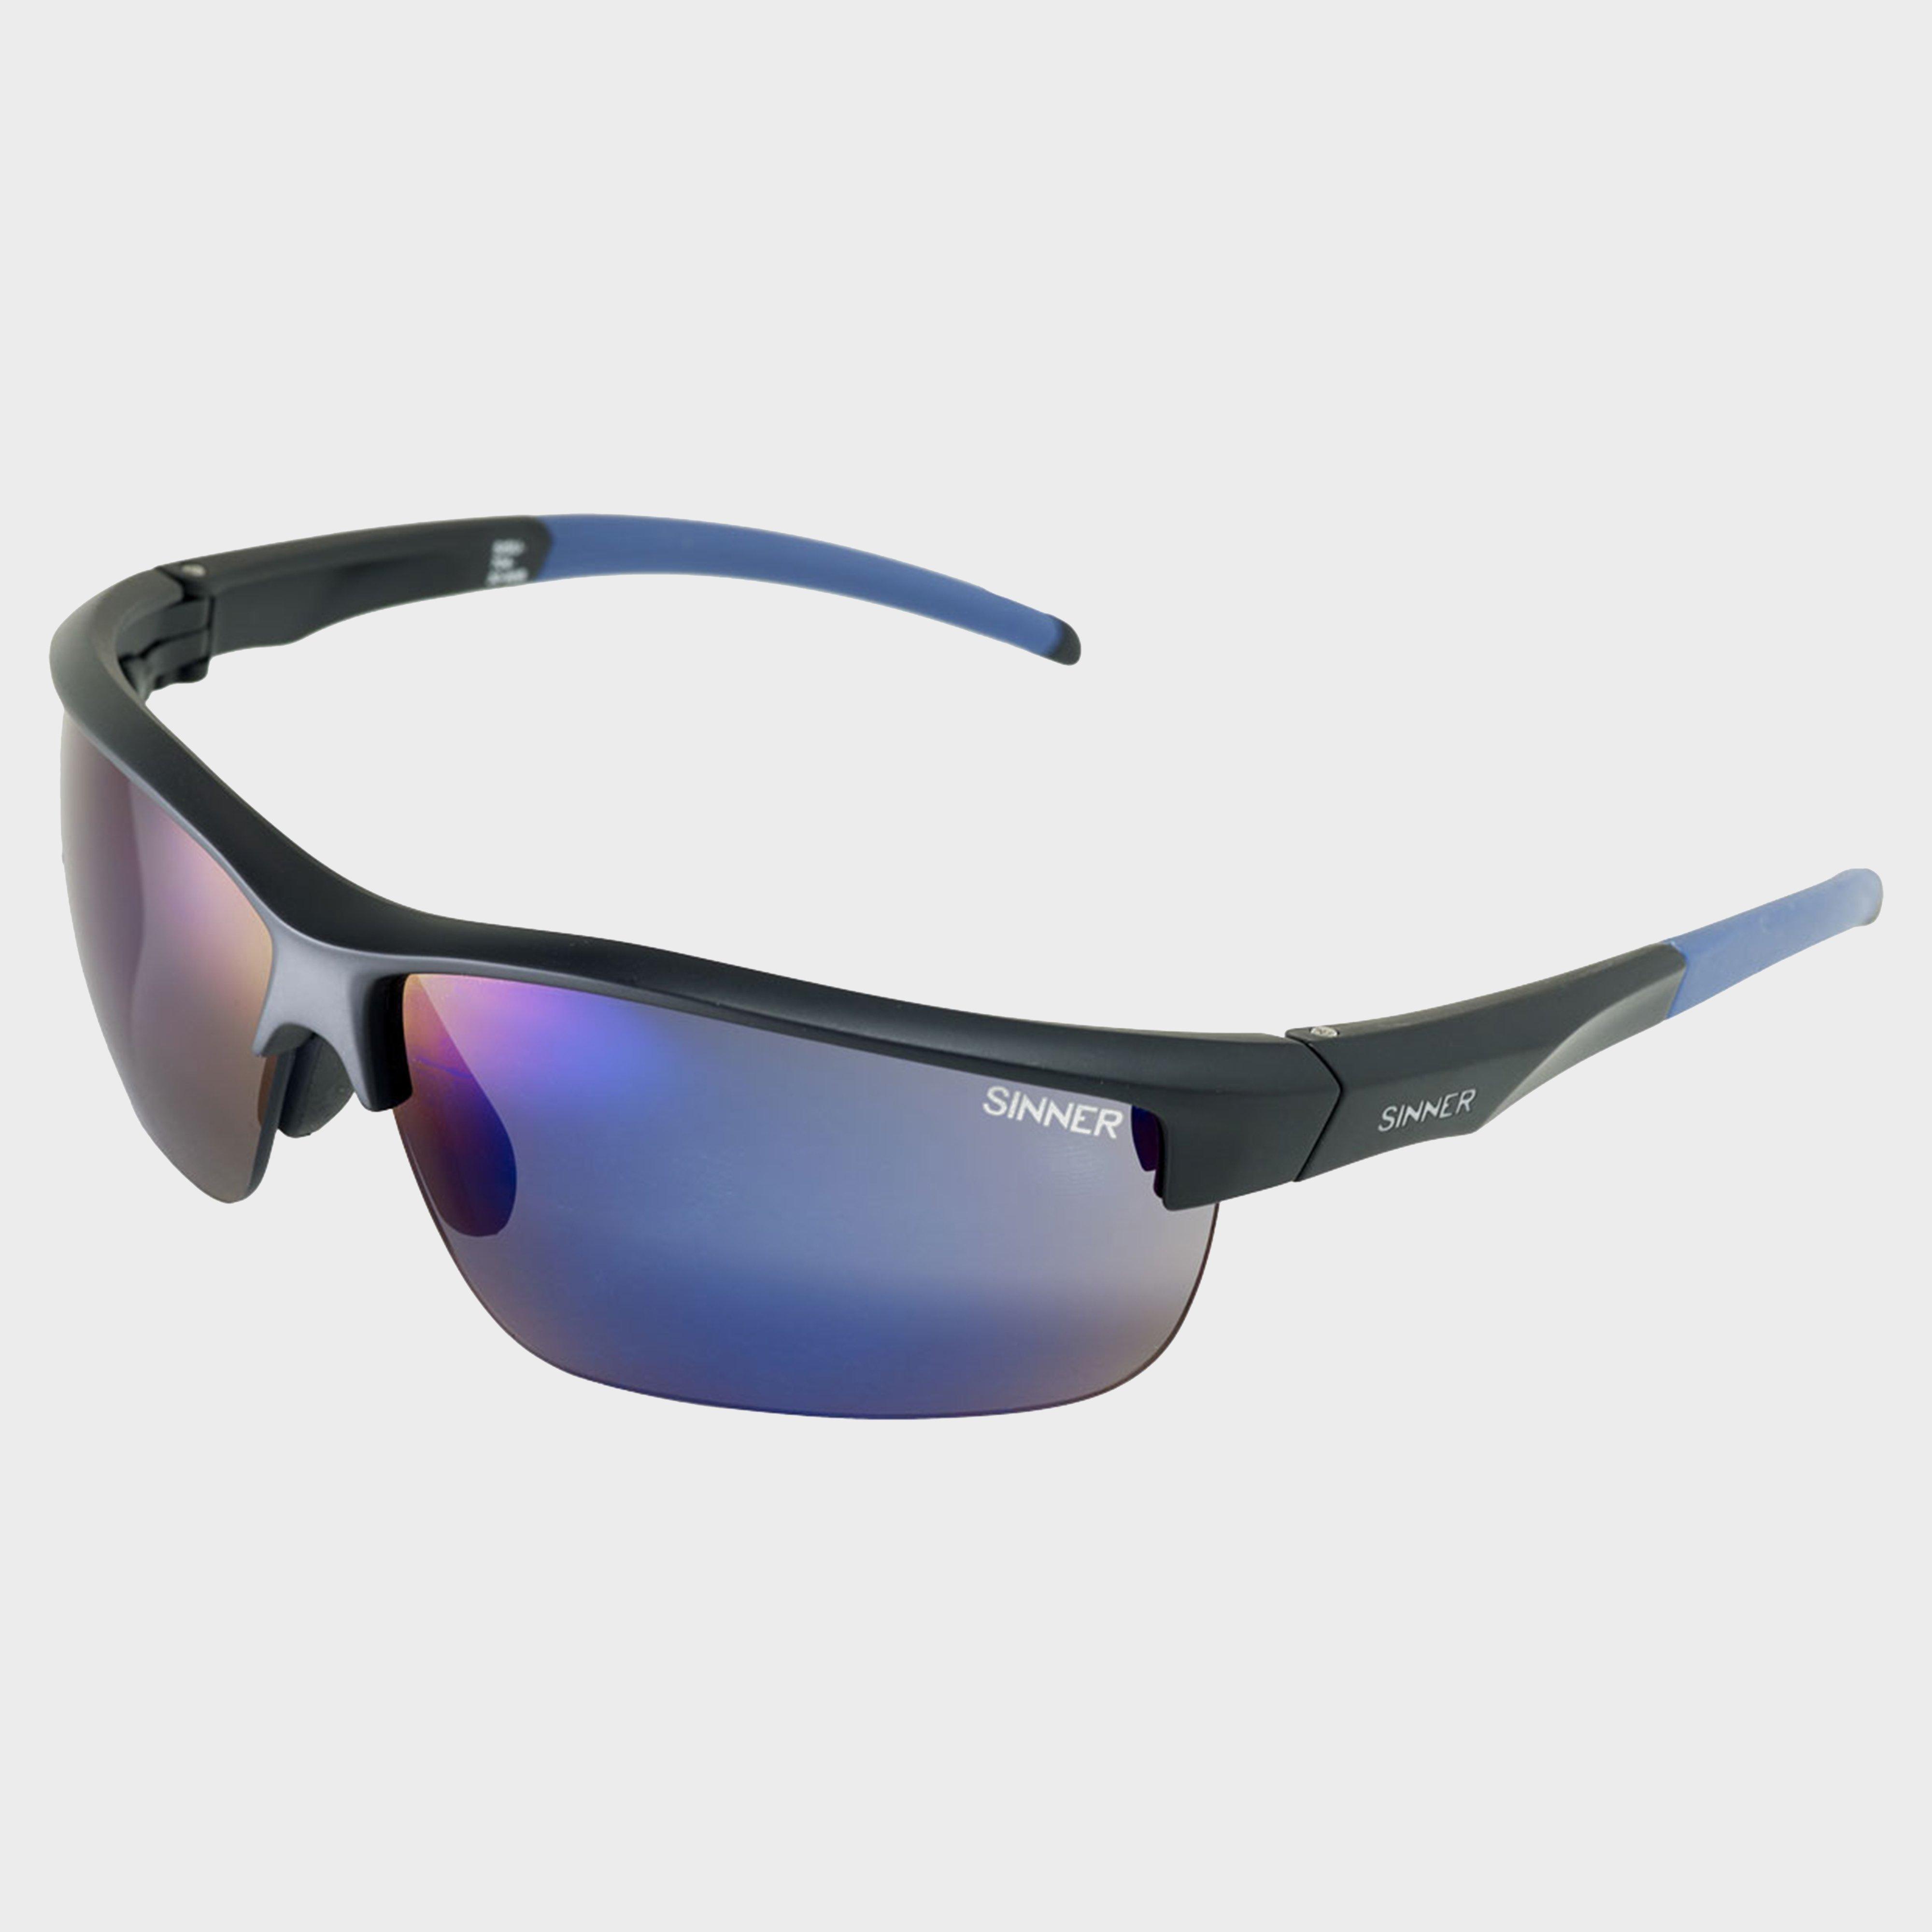 Sinner Sinner Antigua Sport Sunglasses, Grey